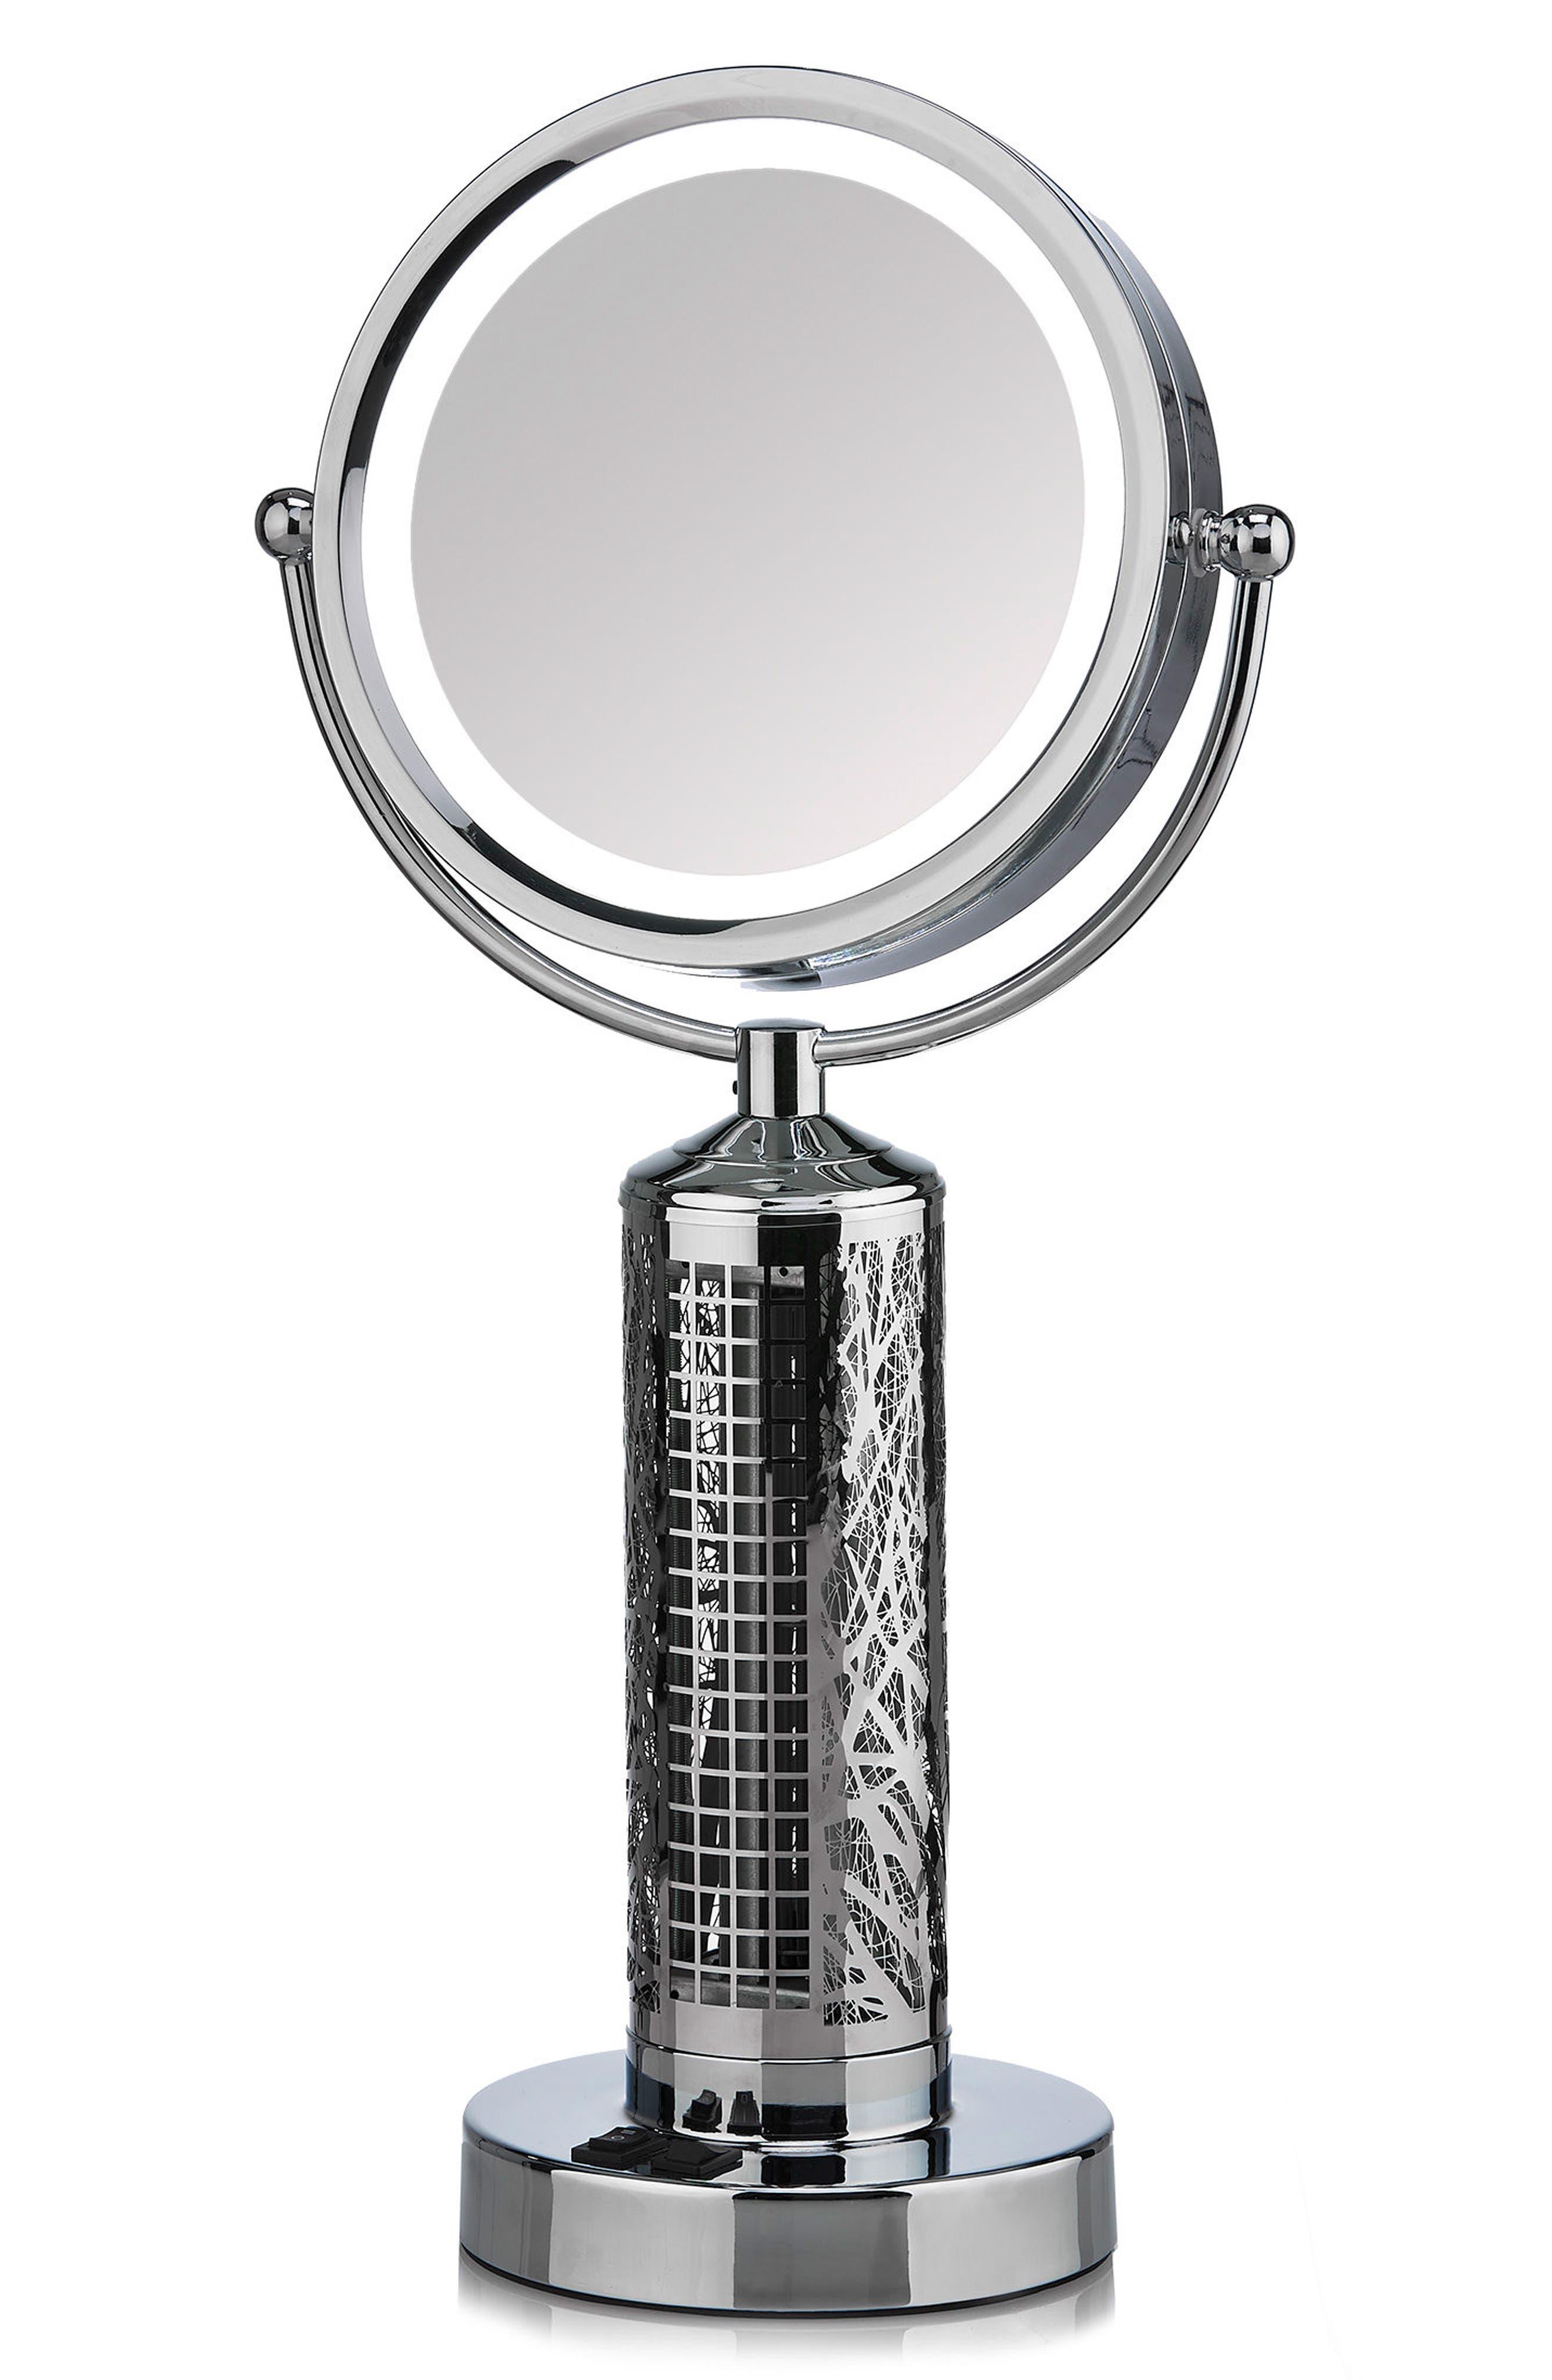 DecoBREEZE Fanity Makeup Mirror with Electric Fan